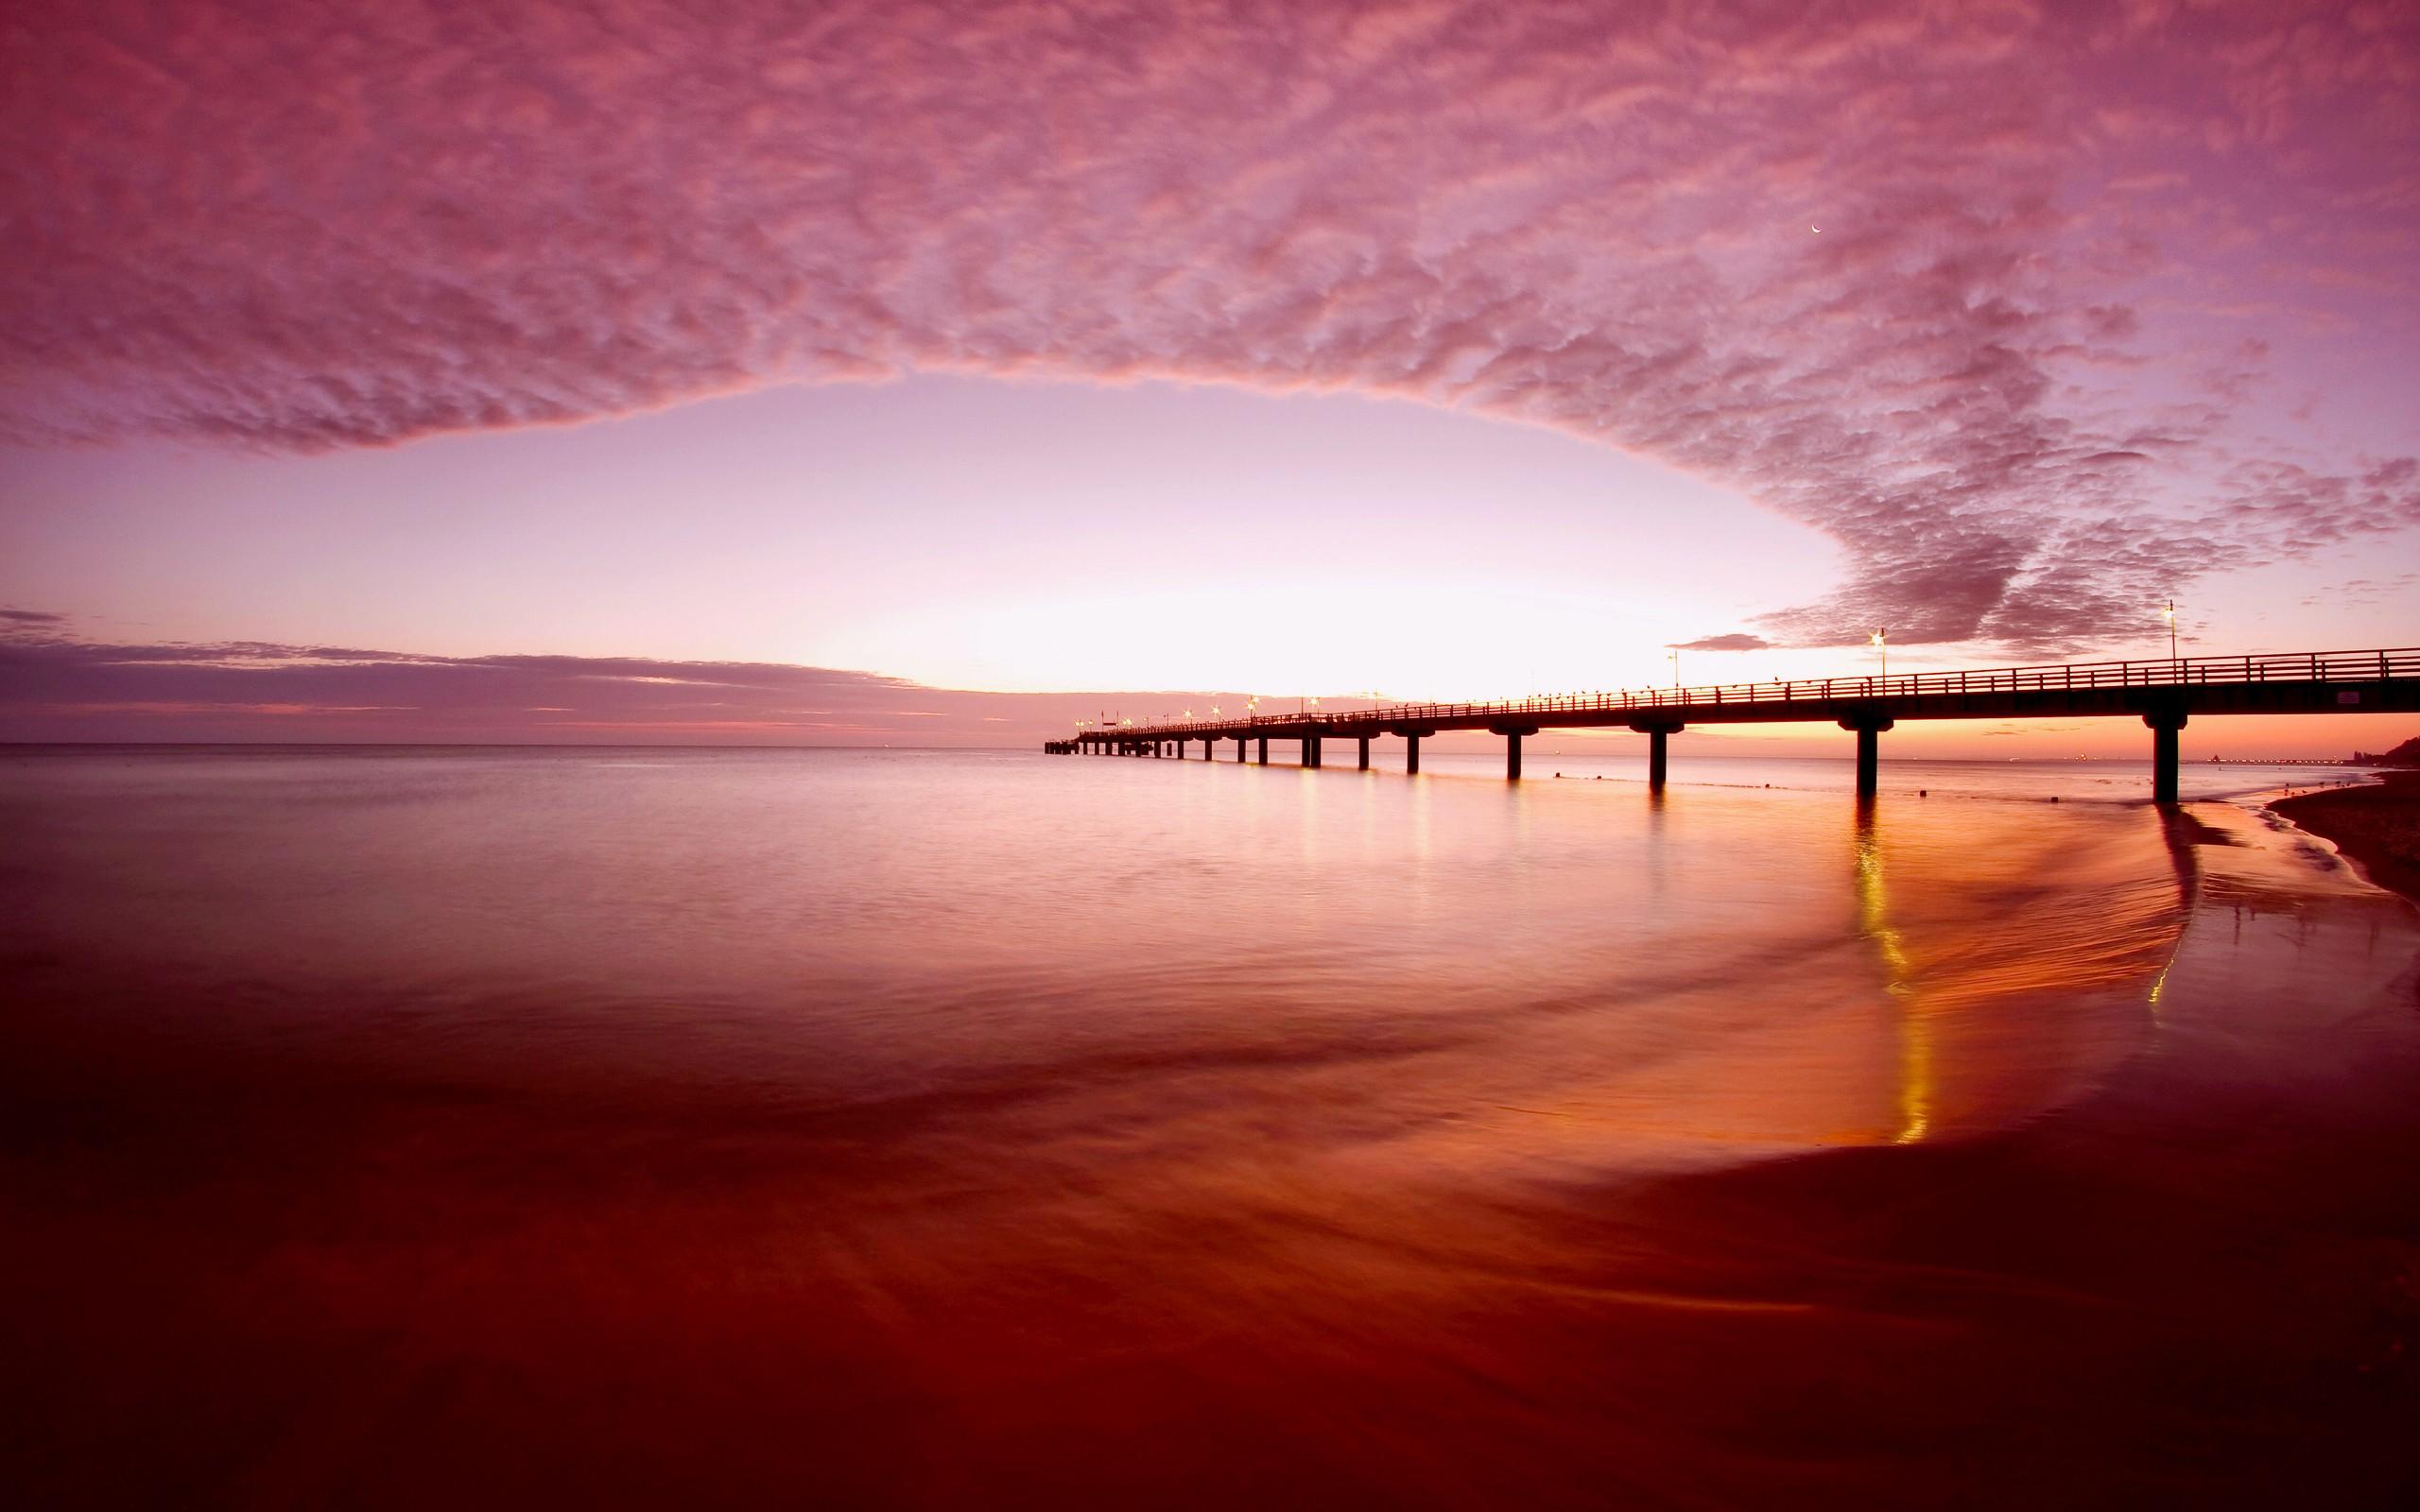 Cielo rosado - 2560x1600